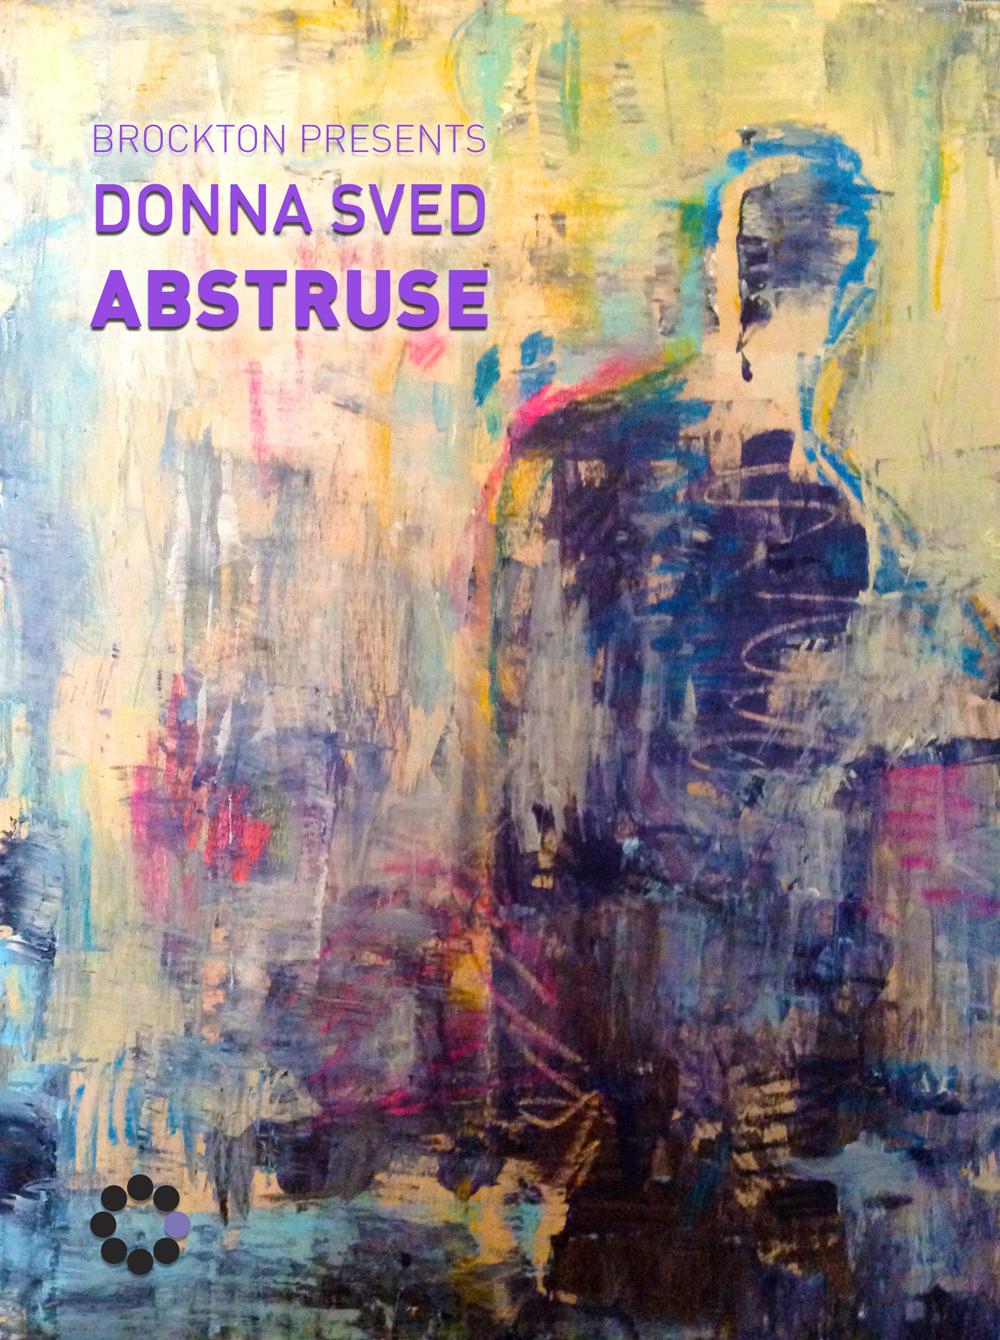 Brockton Presents: Donna Sved | Abstruse